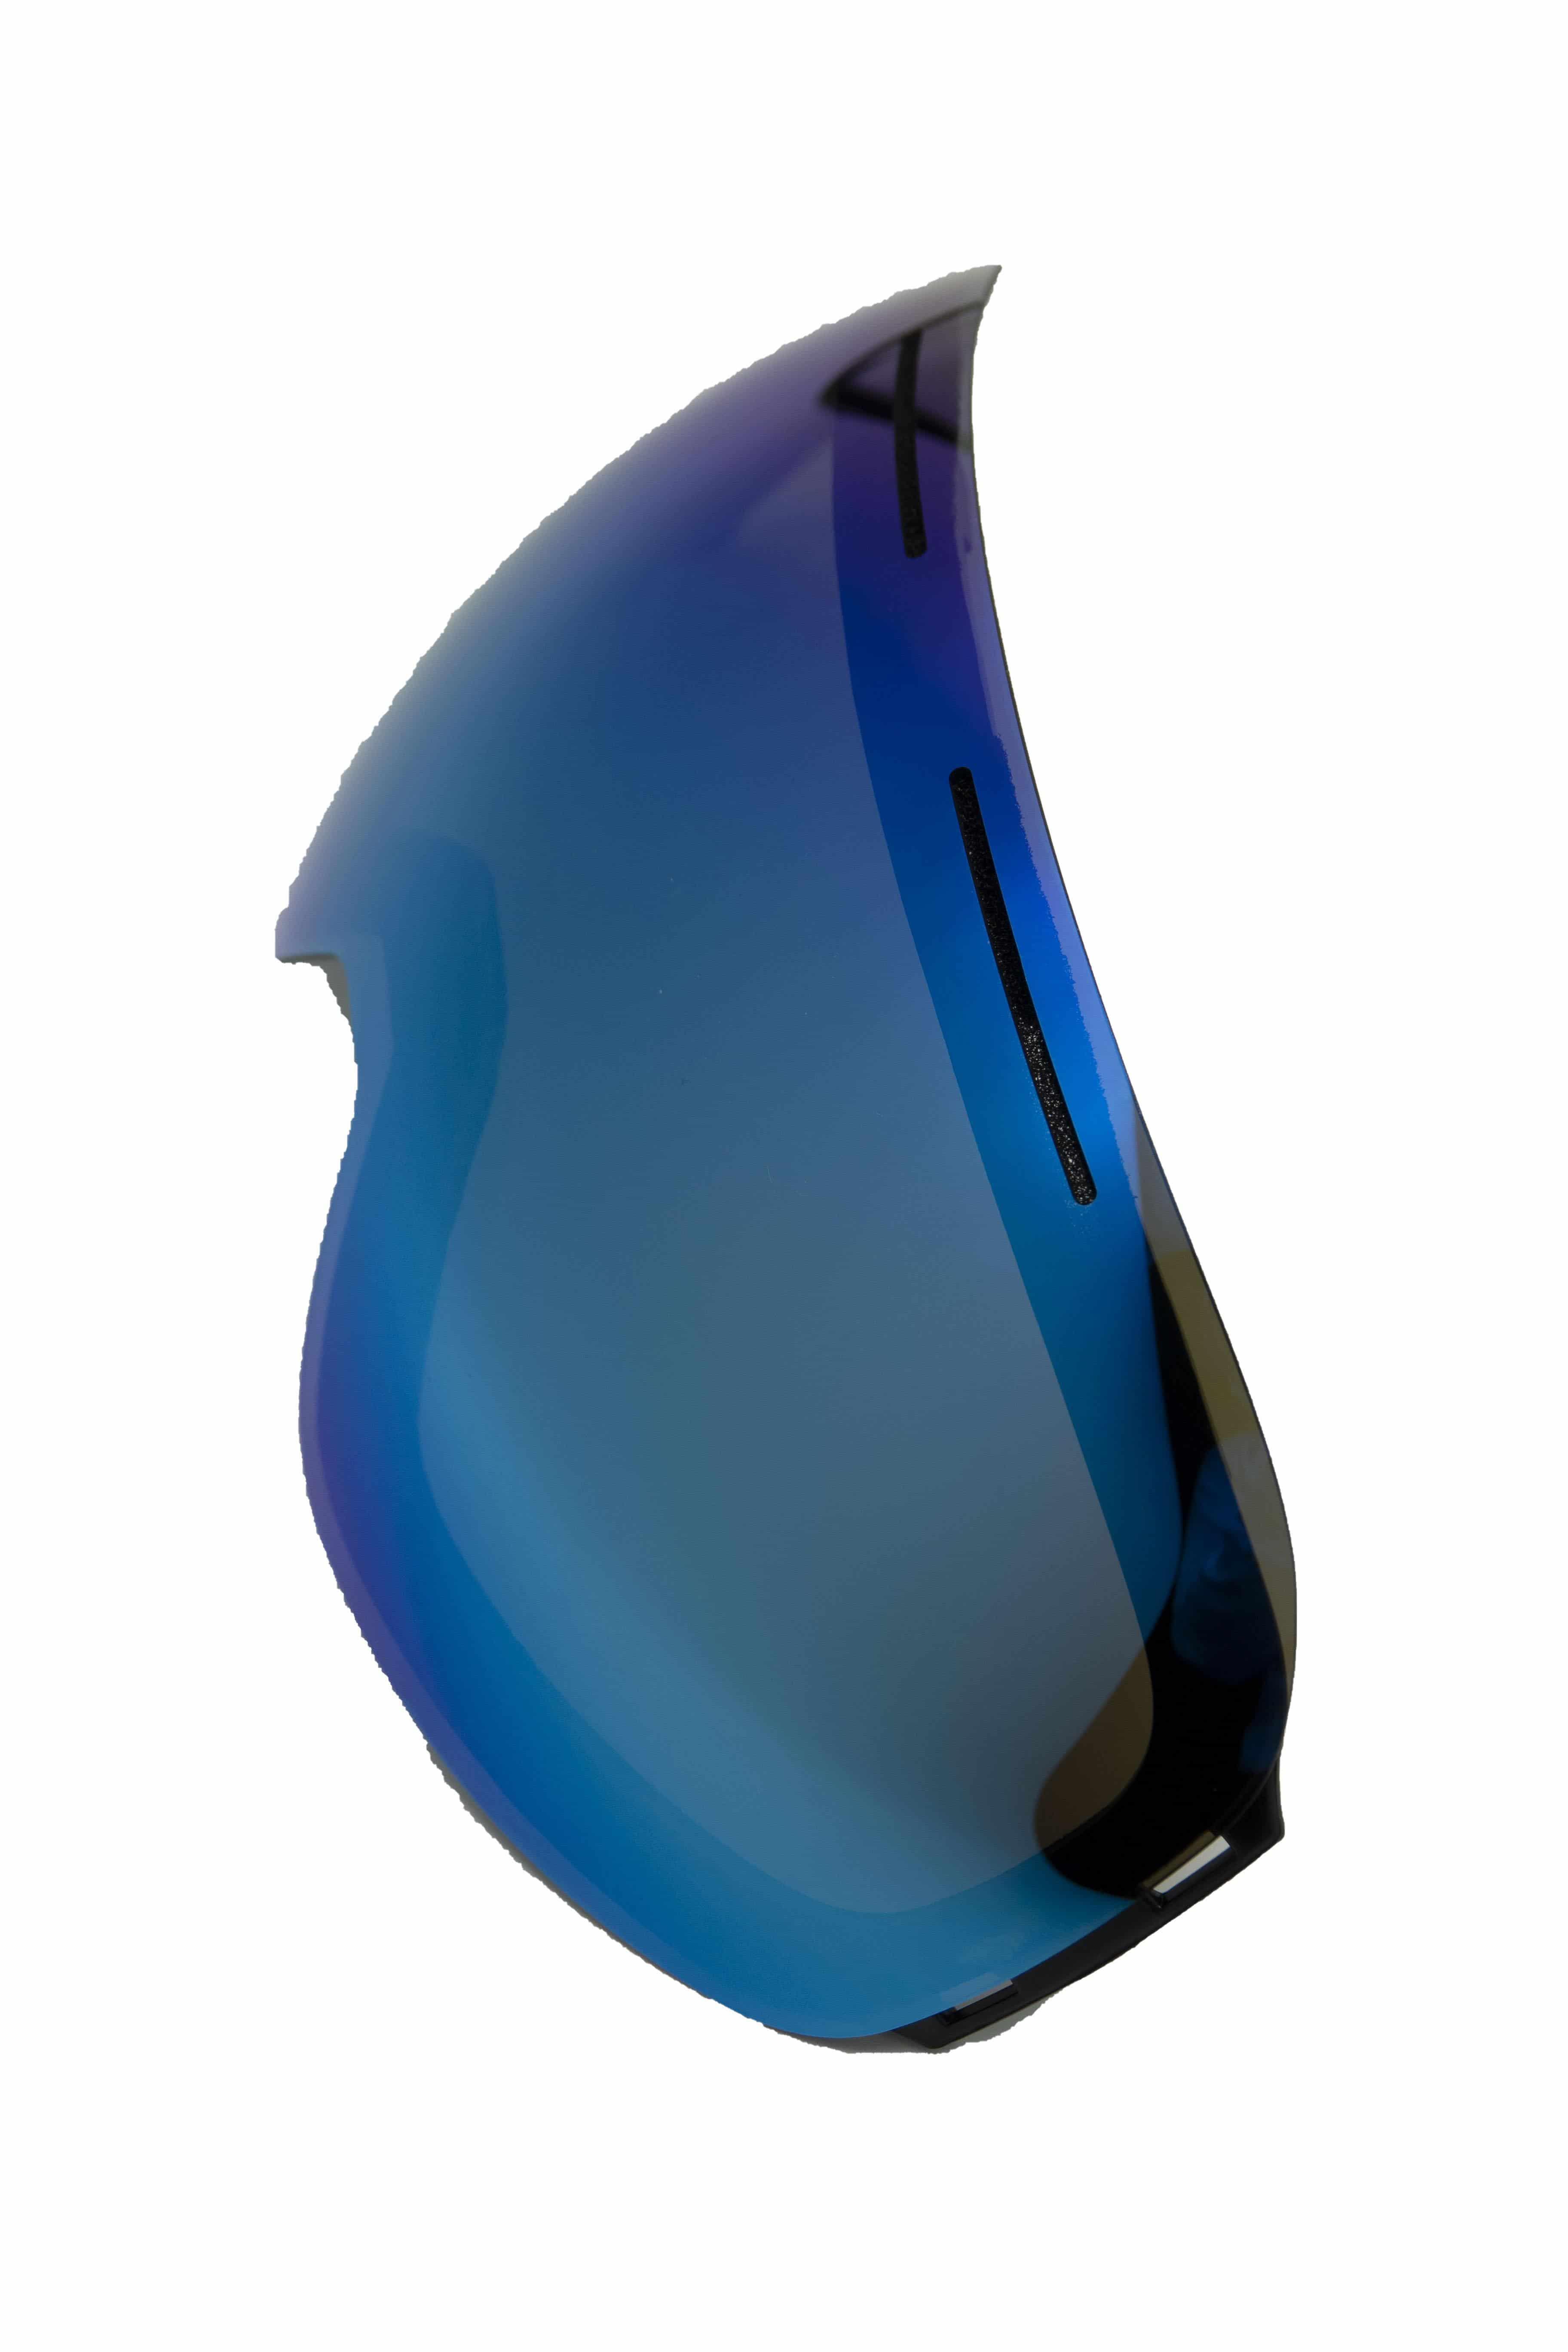 5one® Alpine 7 extra losse lens Revo Ice Blue - blauw spiegelglas